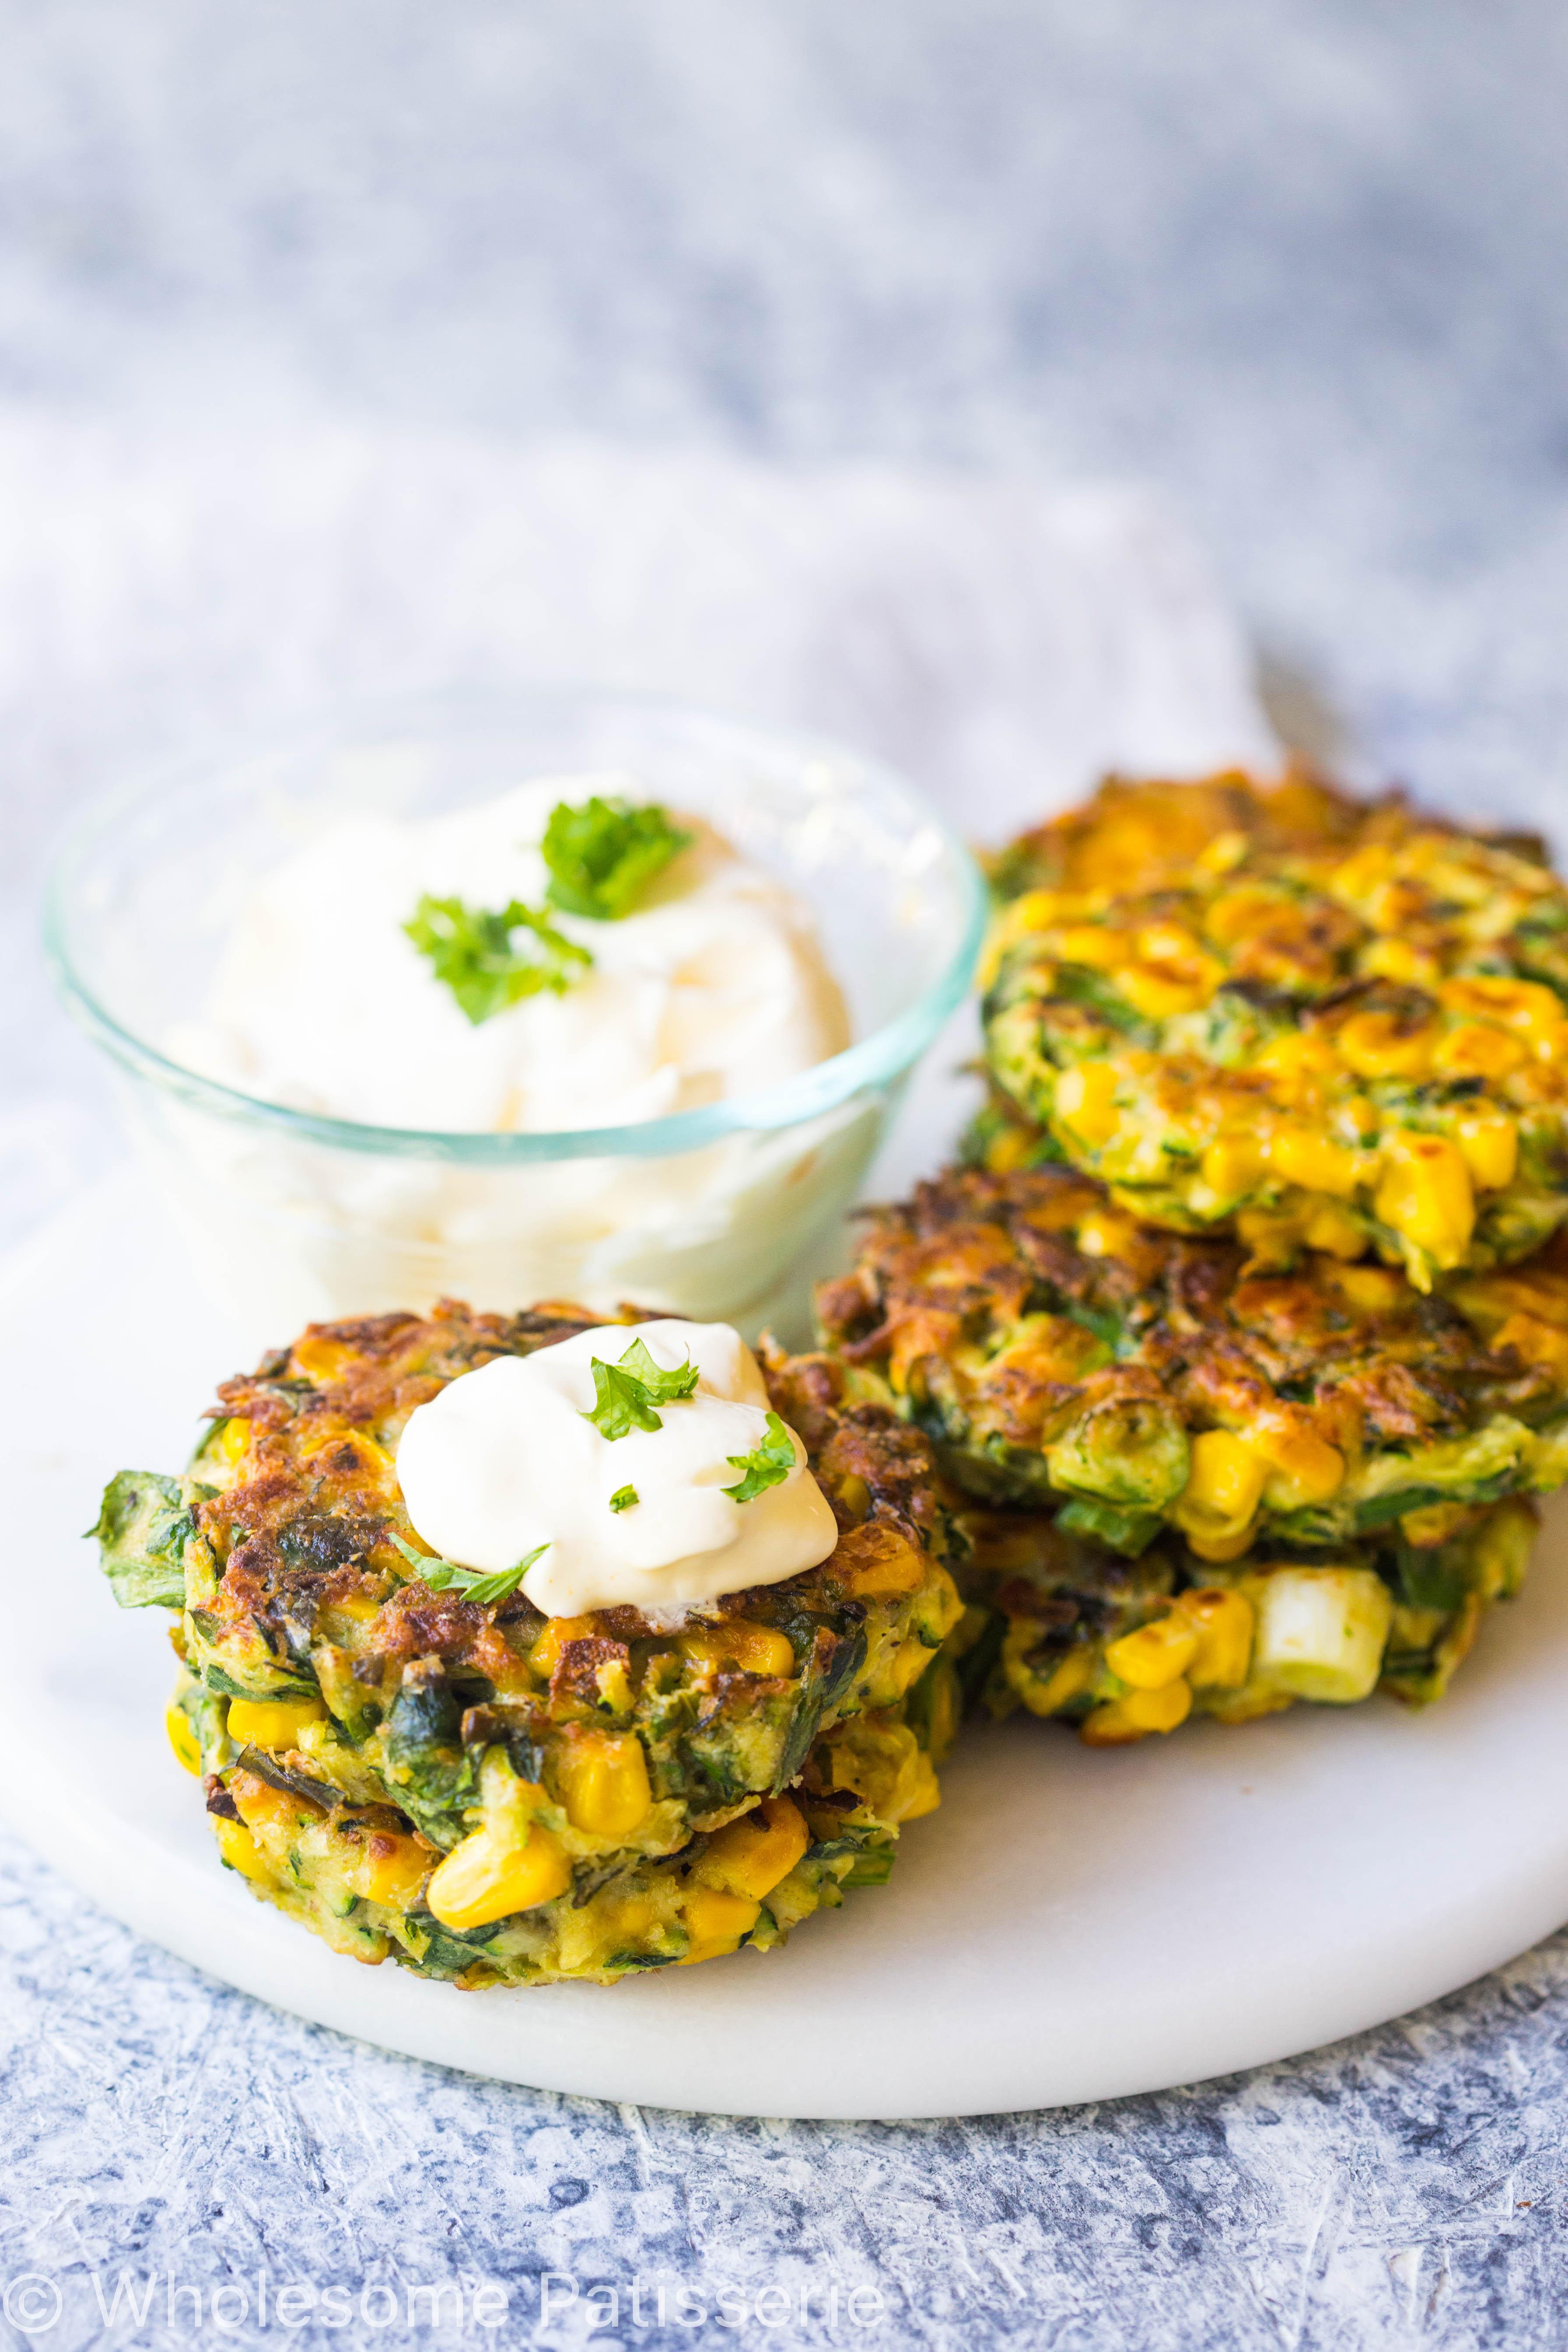 sweet-corn-zucchini-fritters-gluten-free-vegan-vegetarian-side-dish-delicious-dinner-healthy